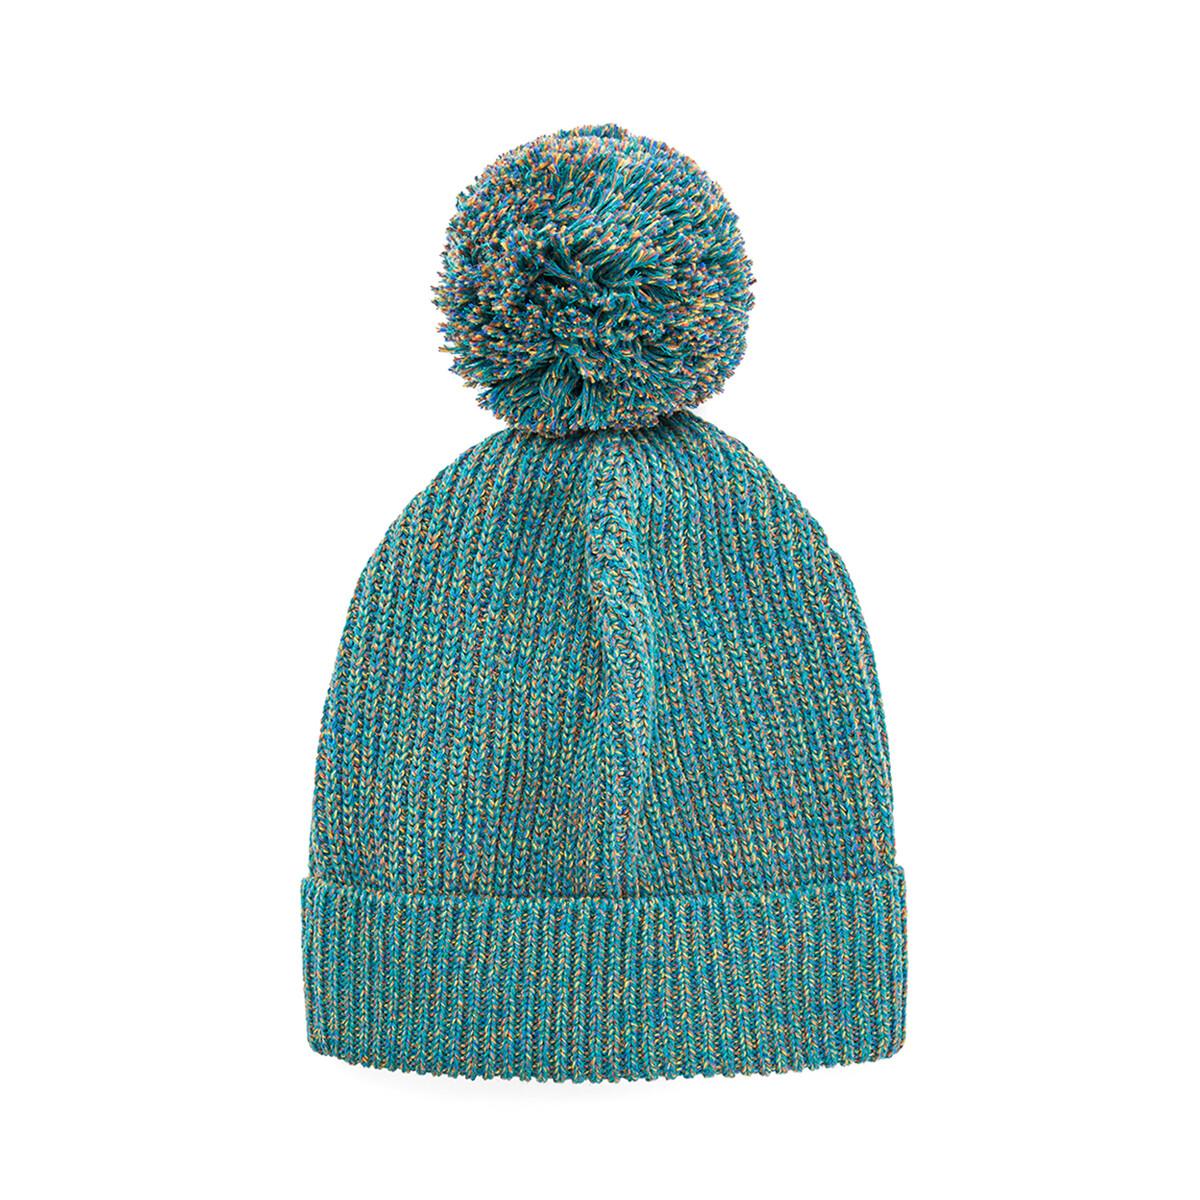 LOEWE Eln Melange Knit Beanie Emerald Green front